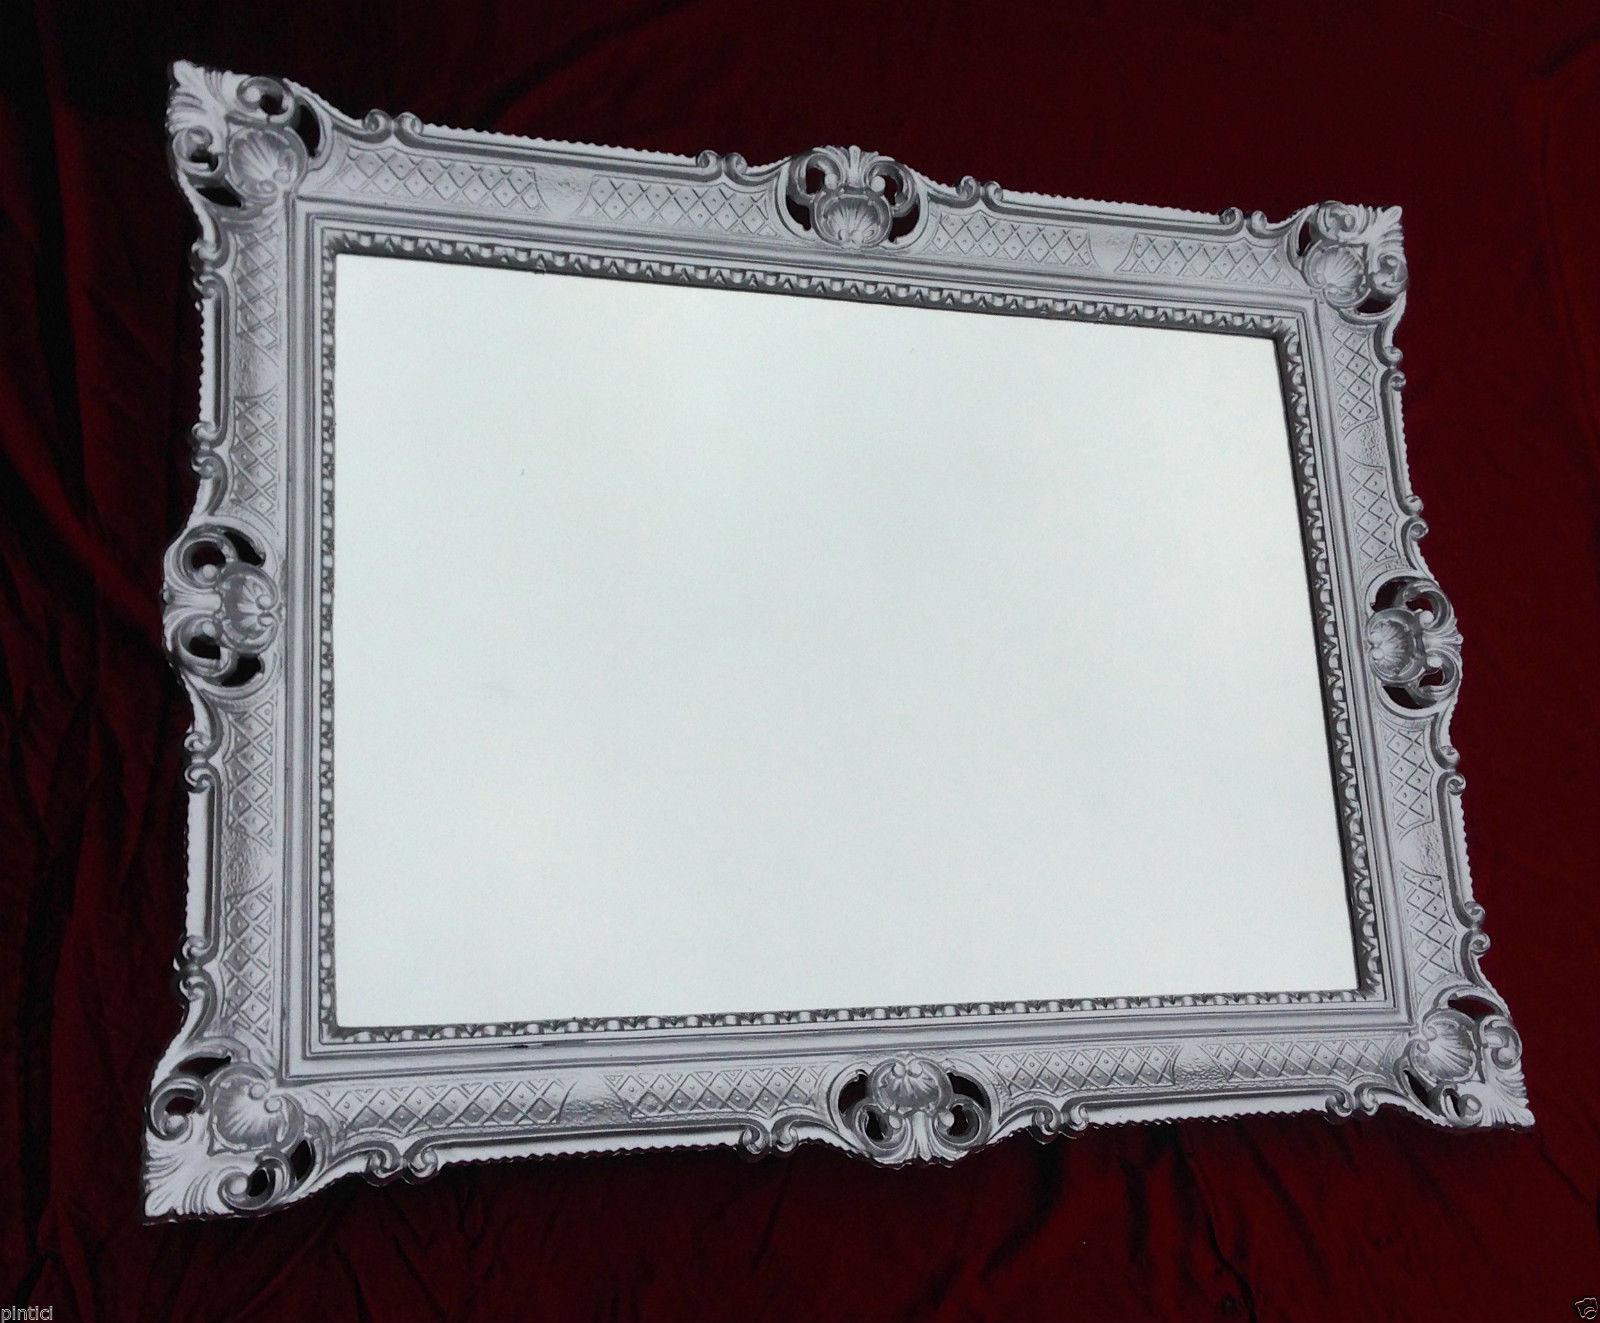 Wandspiegel Silber Barock Großer Spiegel Antik 90x70